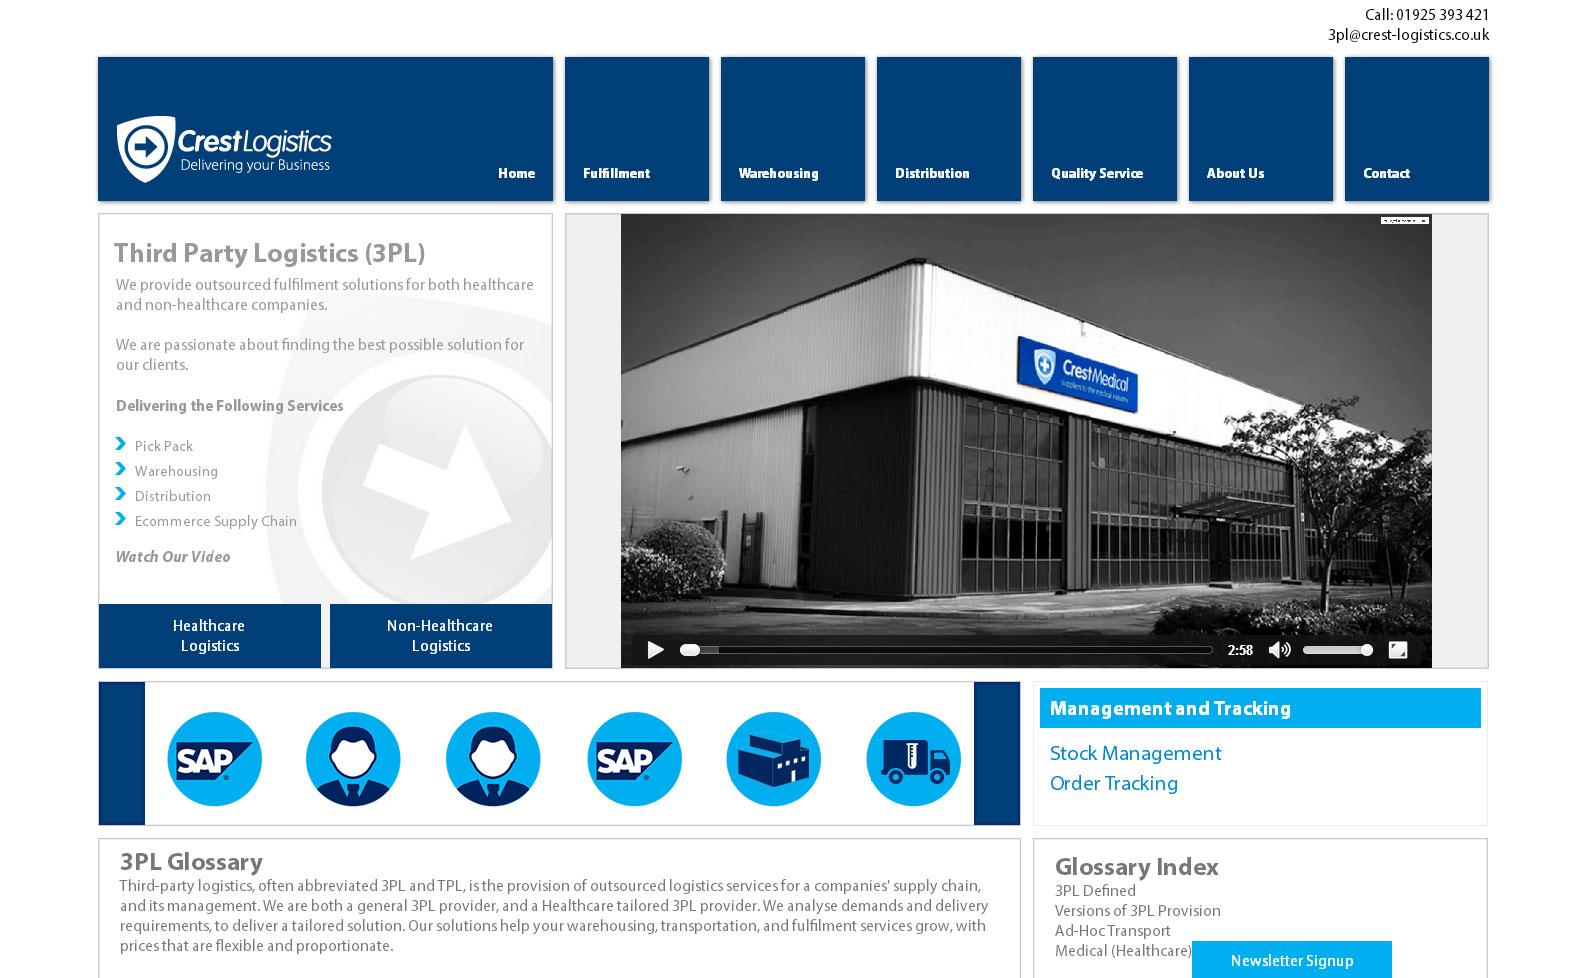 Crest logistics website